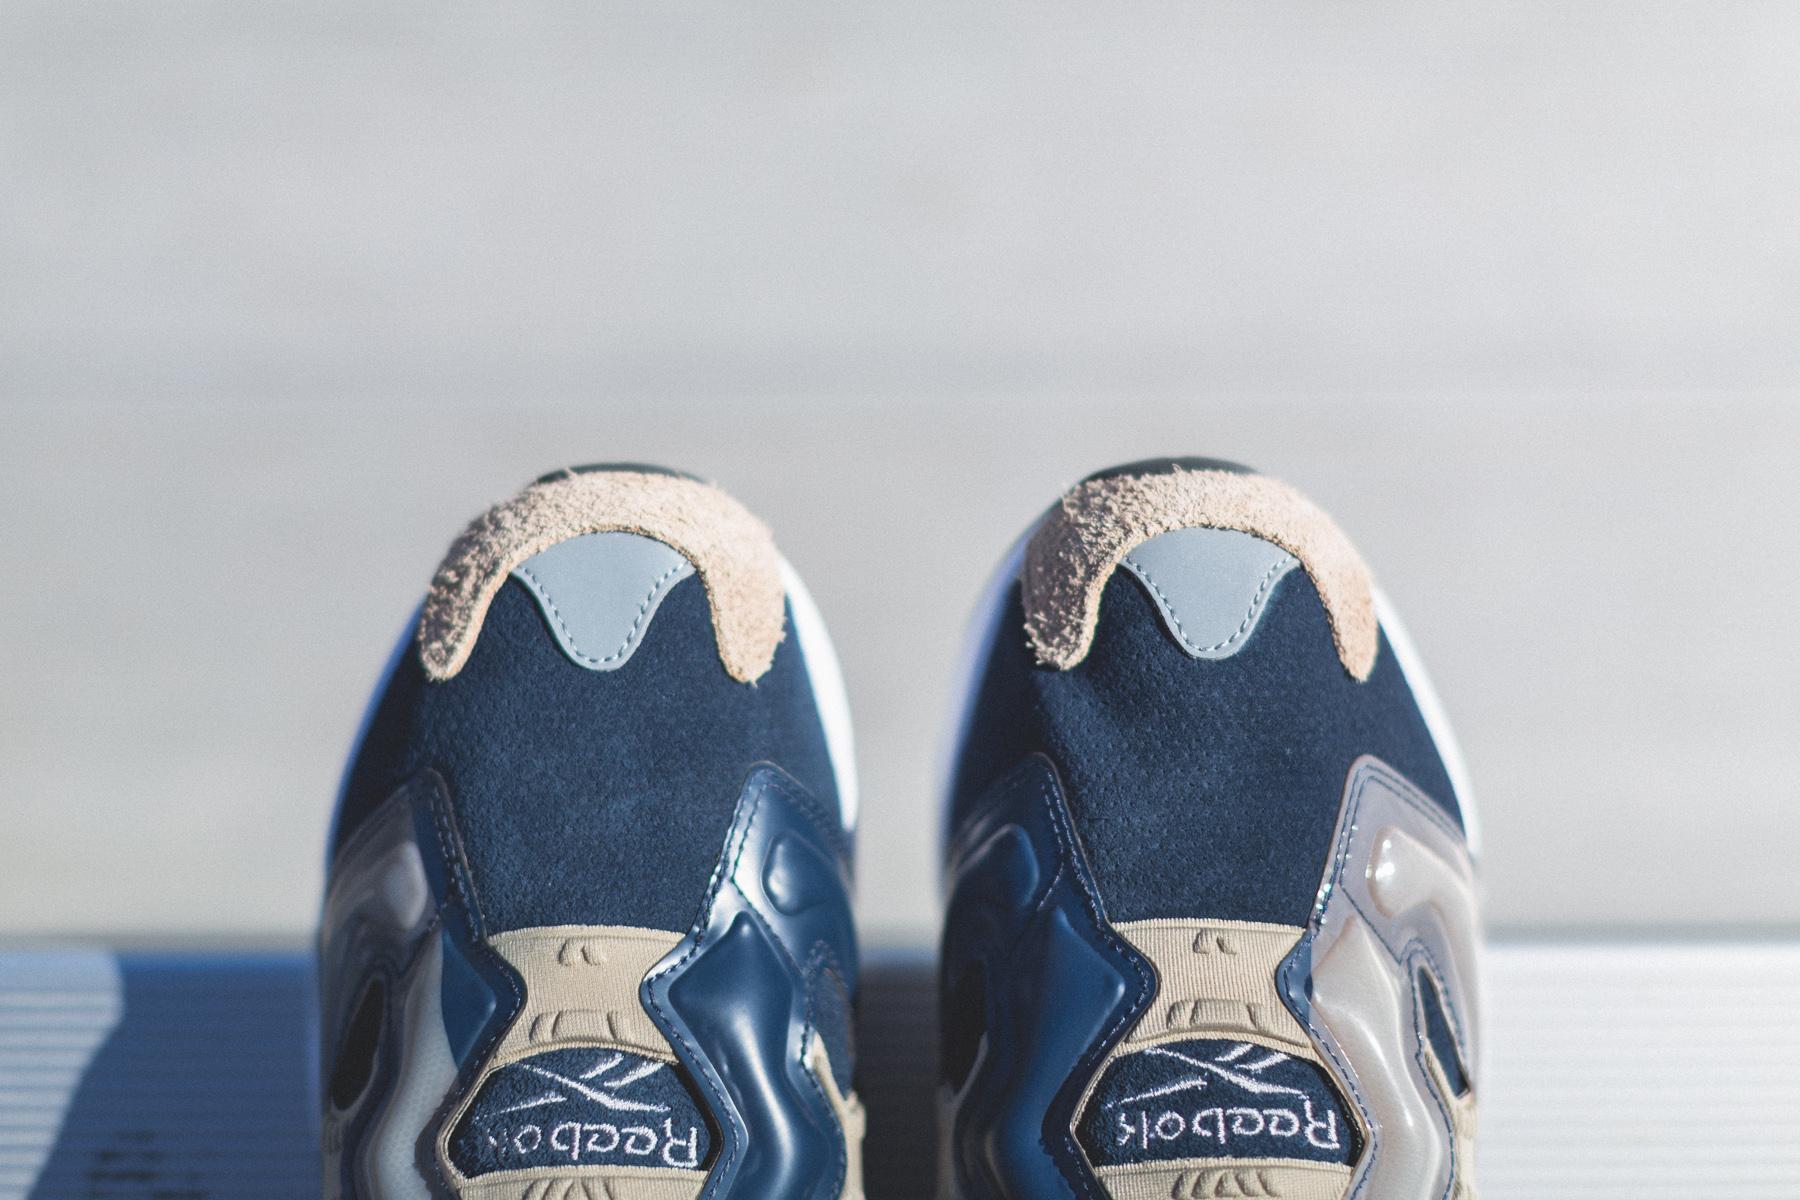 Footpatrol x Reebok Instapump Fury 20th Anniversary